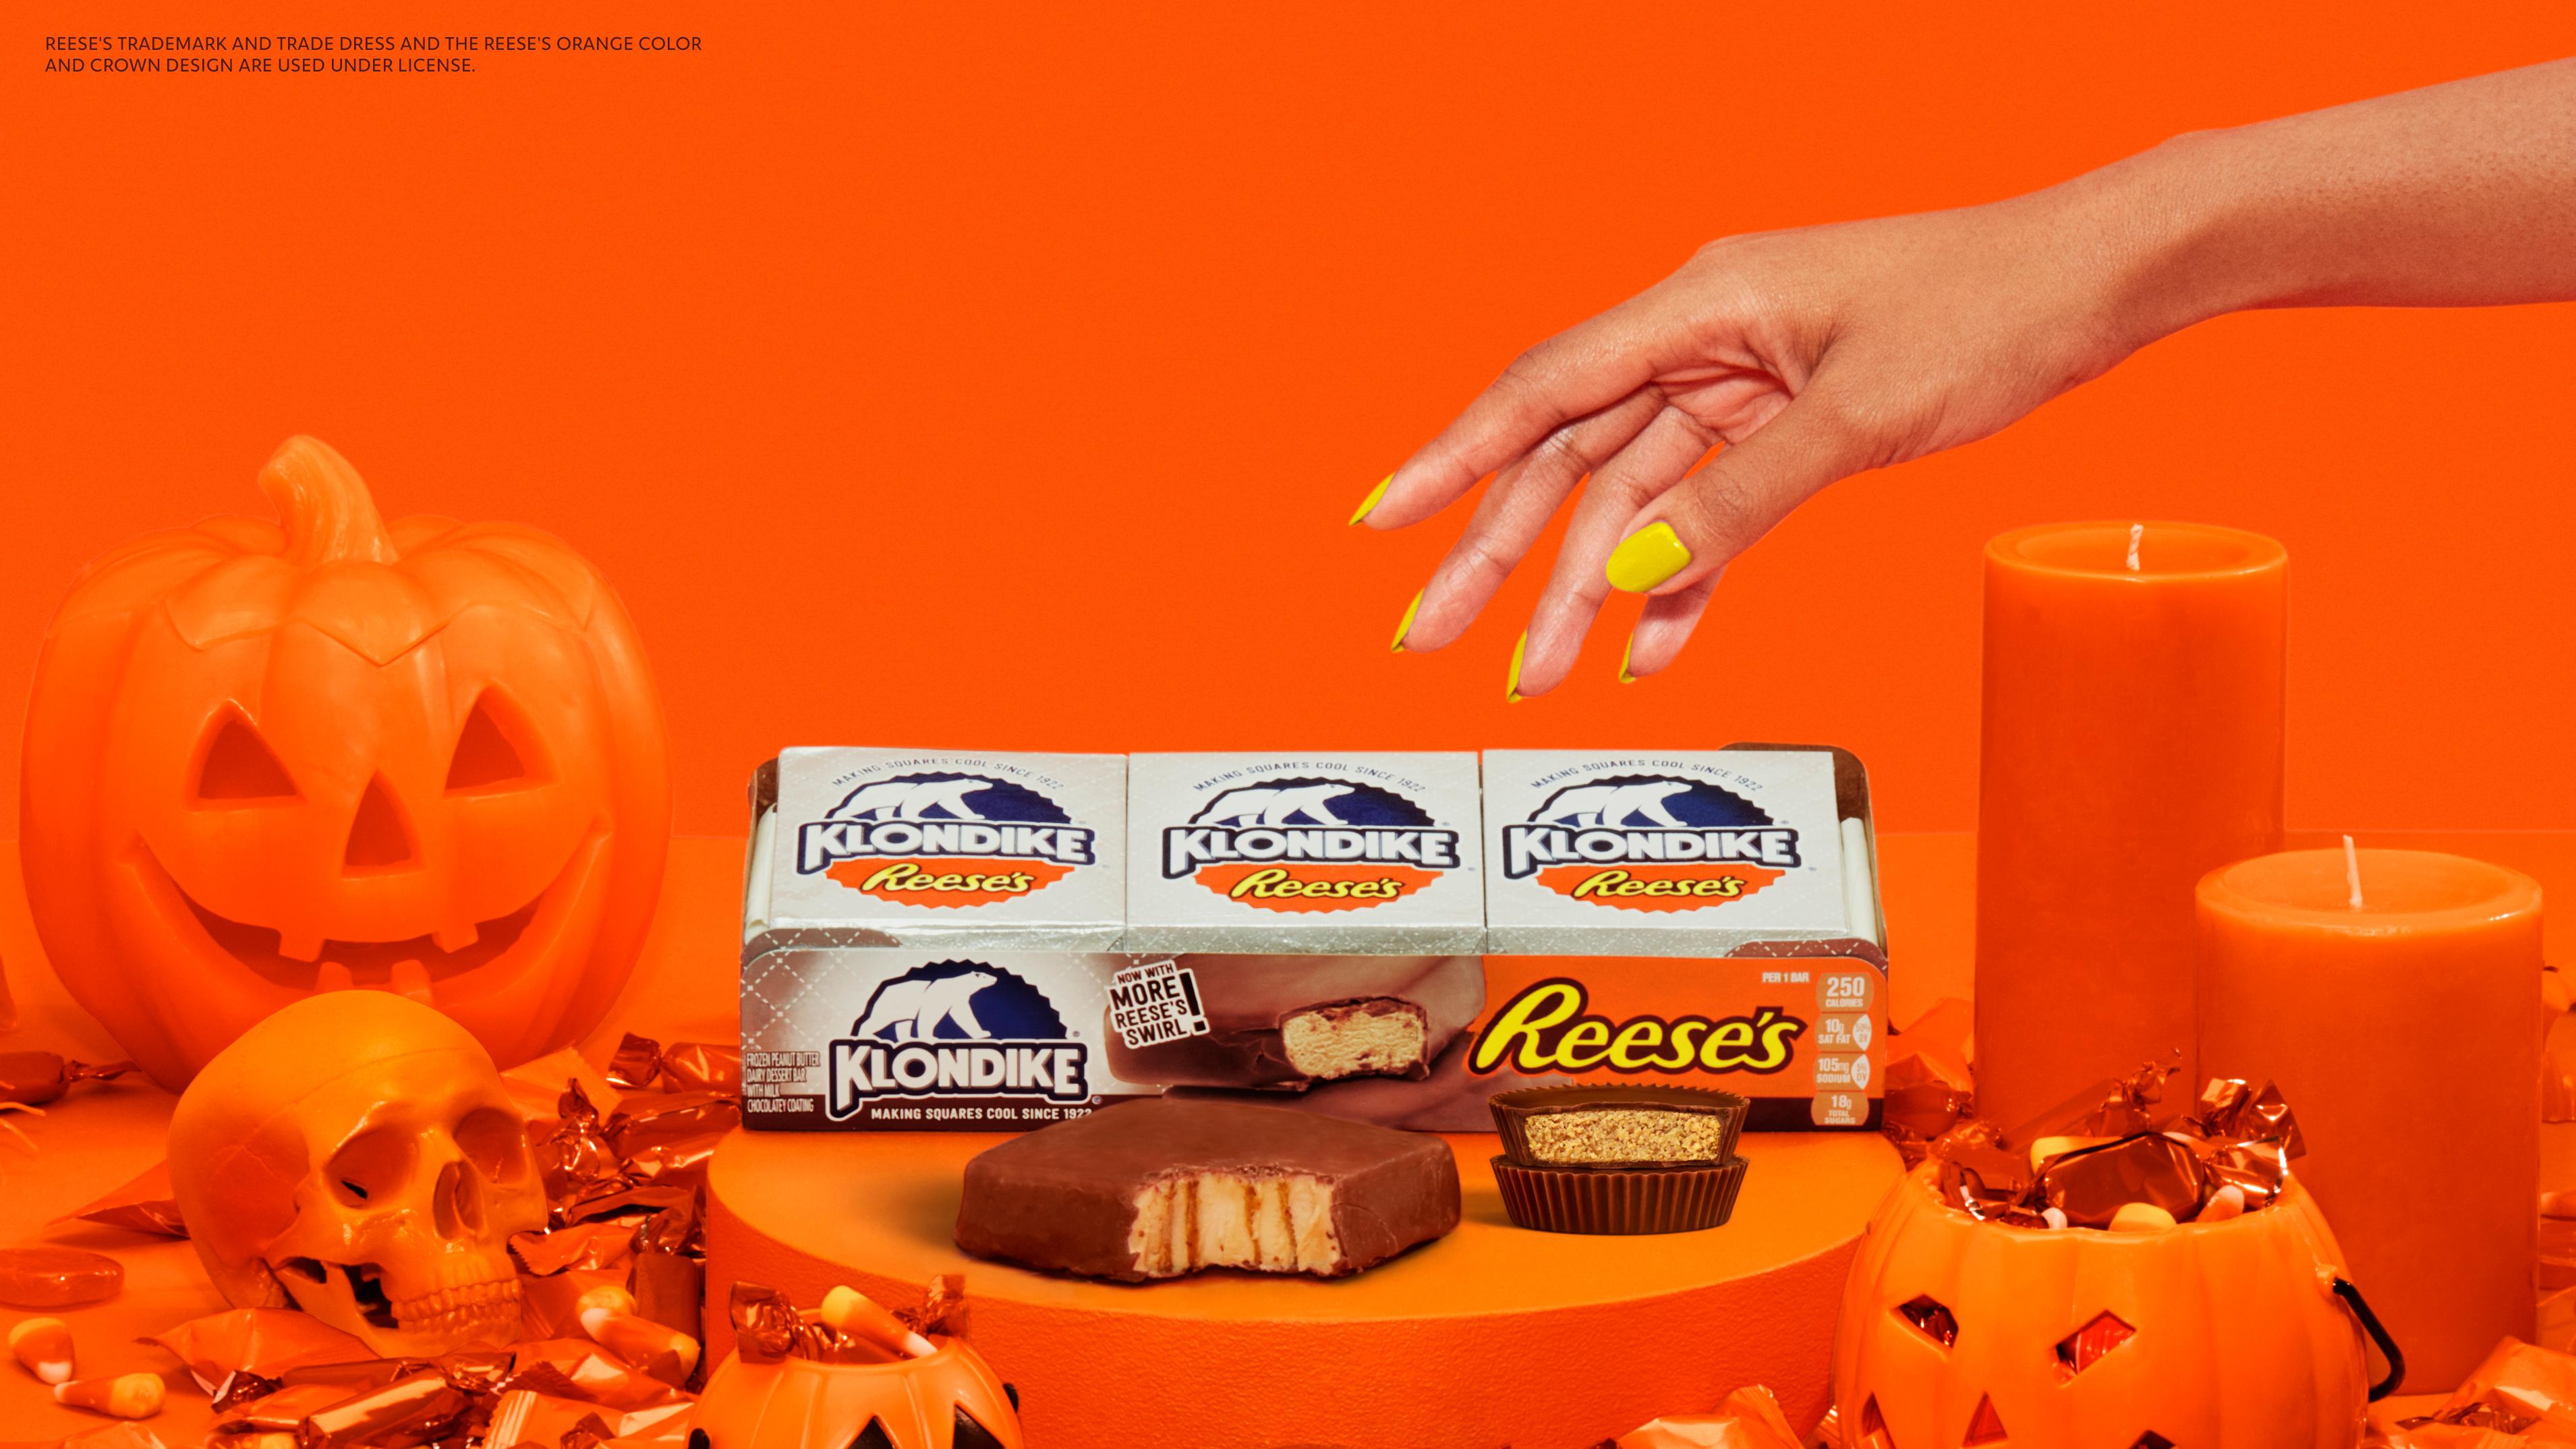 2021_KlondikeSolo_ReesesIceCream_H16x9-attrition-1 ¡Halloween también es para los padres!